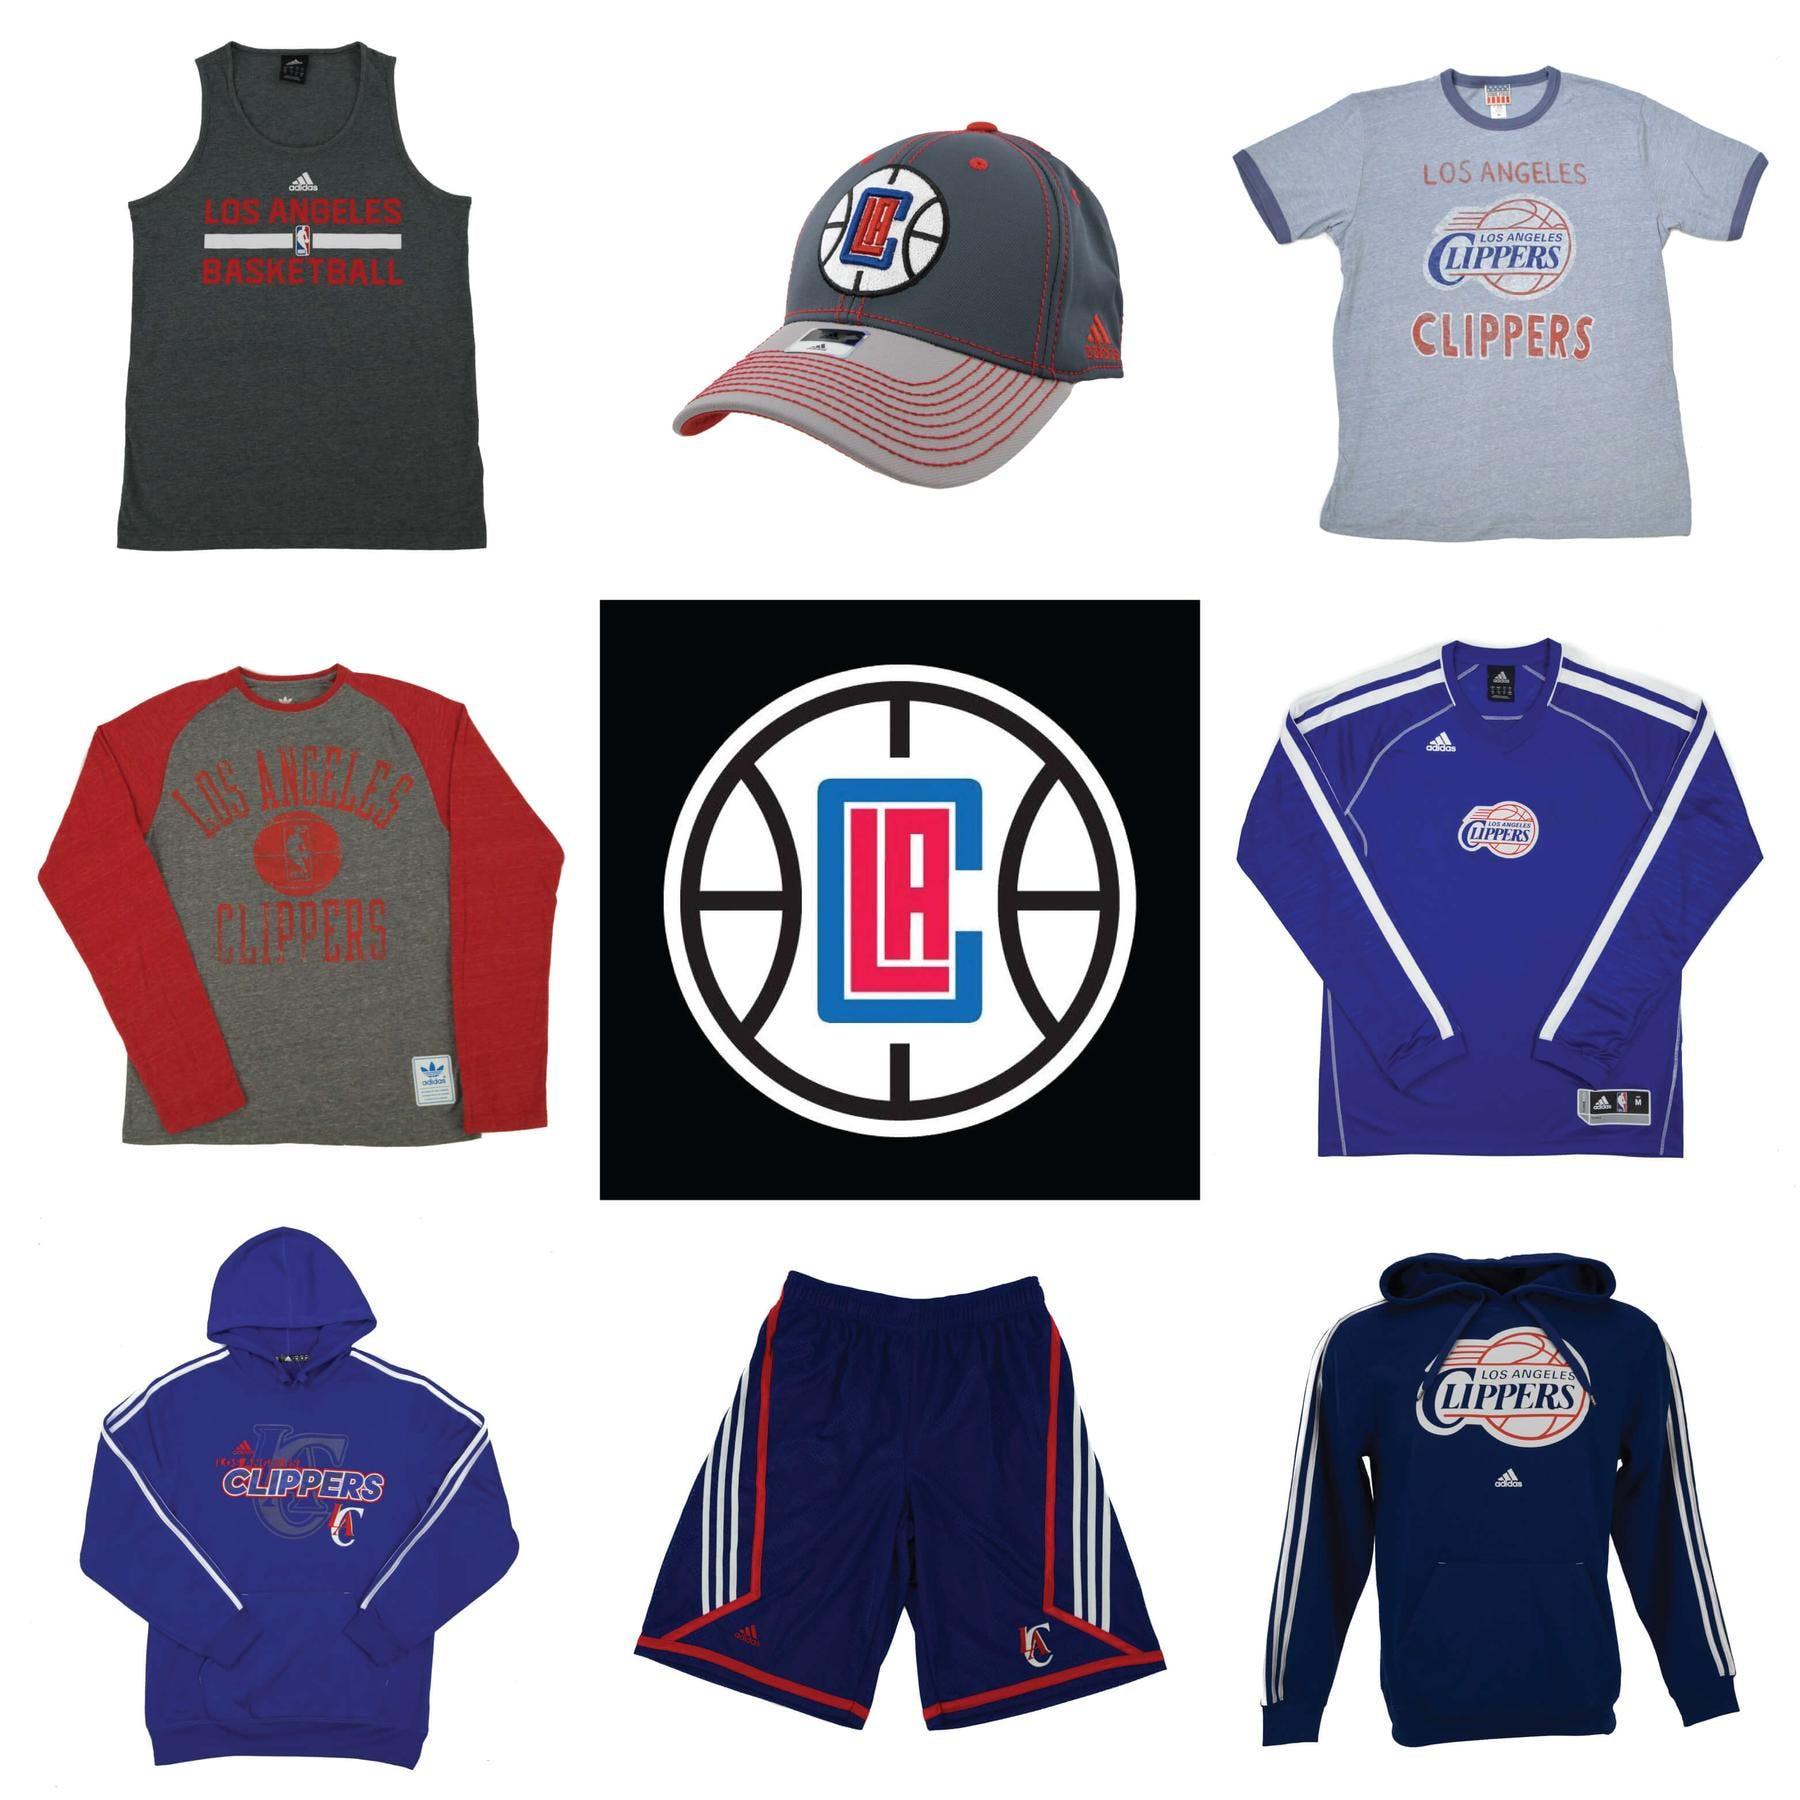 0e04ebf1e Los Angeles Clippers Officially Licensed NBA Apparel Liquidation ...